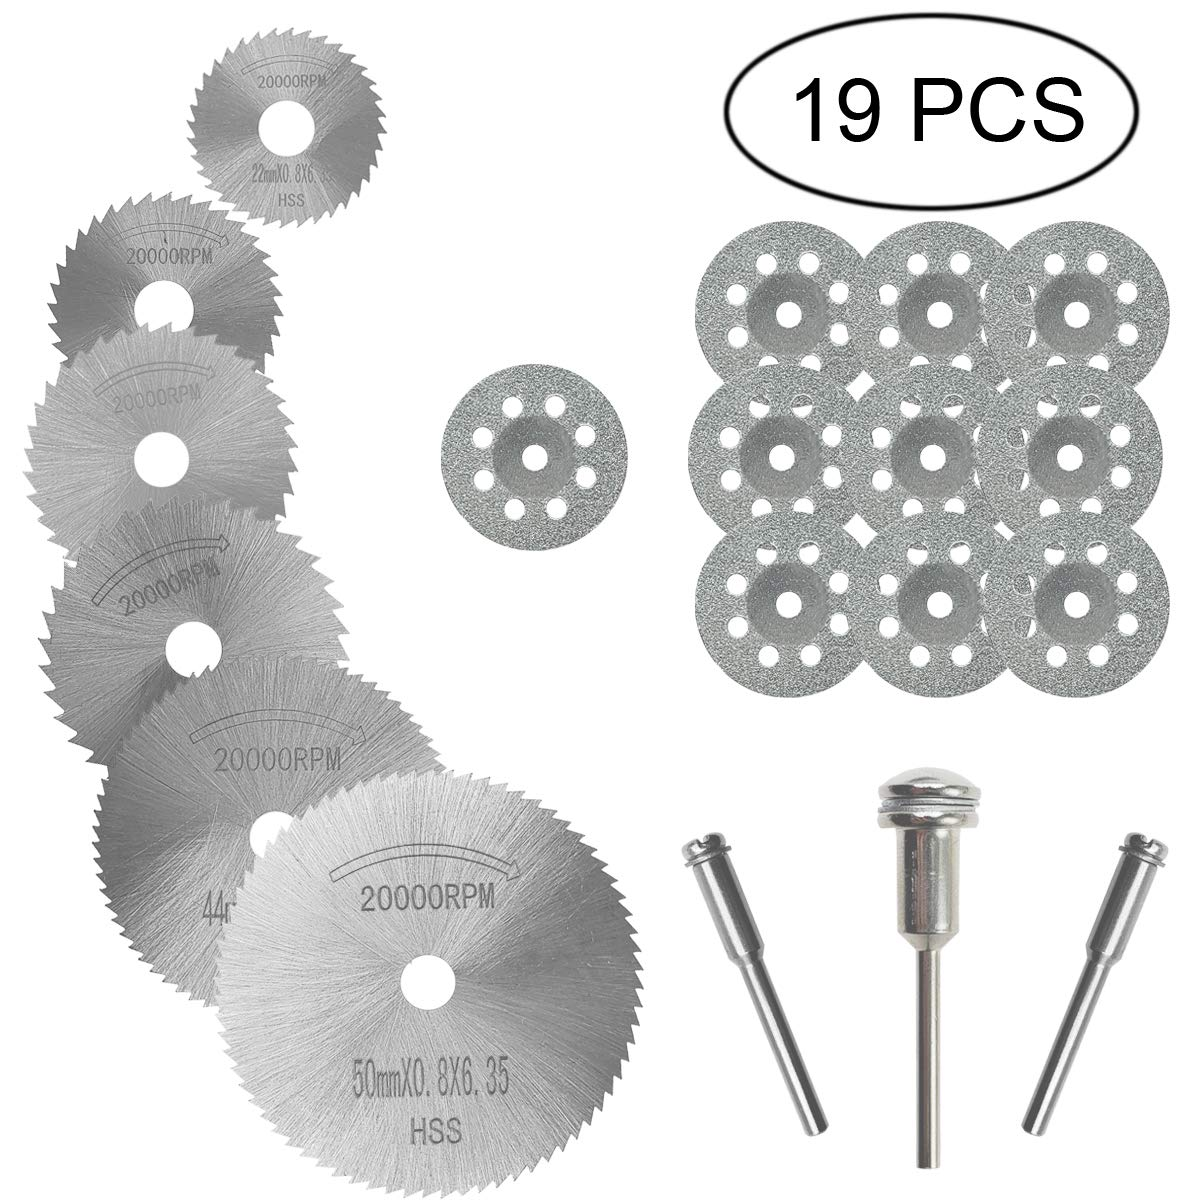 M-jump 19 PCS Rotary Cutting Wheels Tool Kit, Mini Diamond Cutting Wheel and HSS Circular Saw Blades Metal Cutting Wheels Tools Wood Metal Stone Cutting